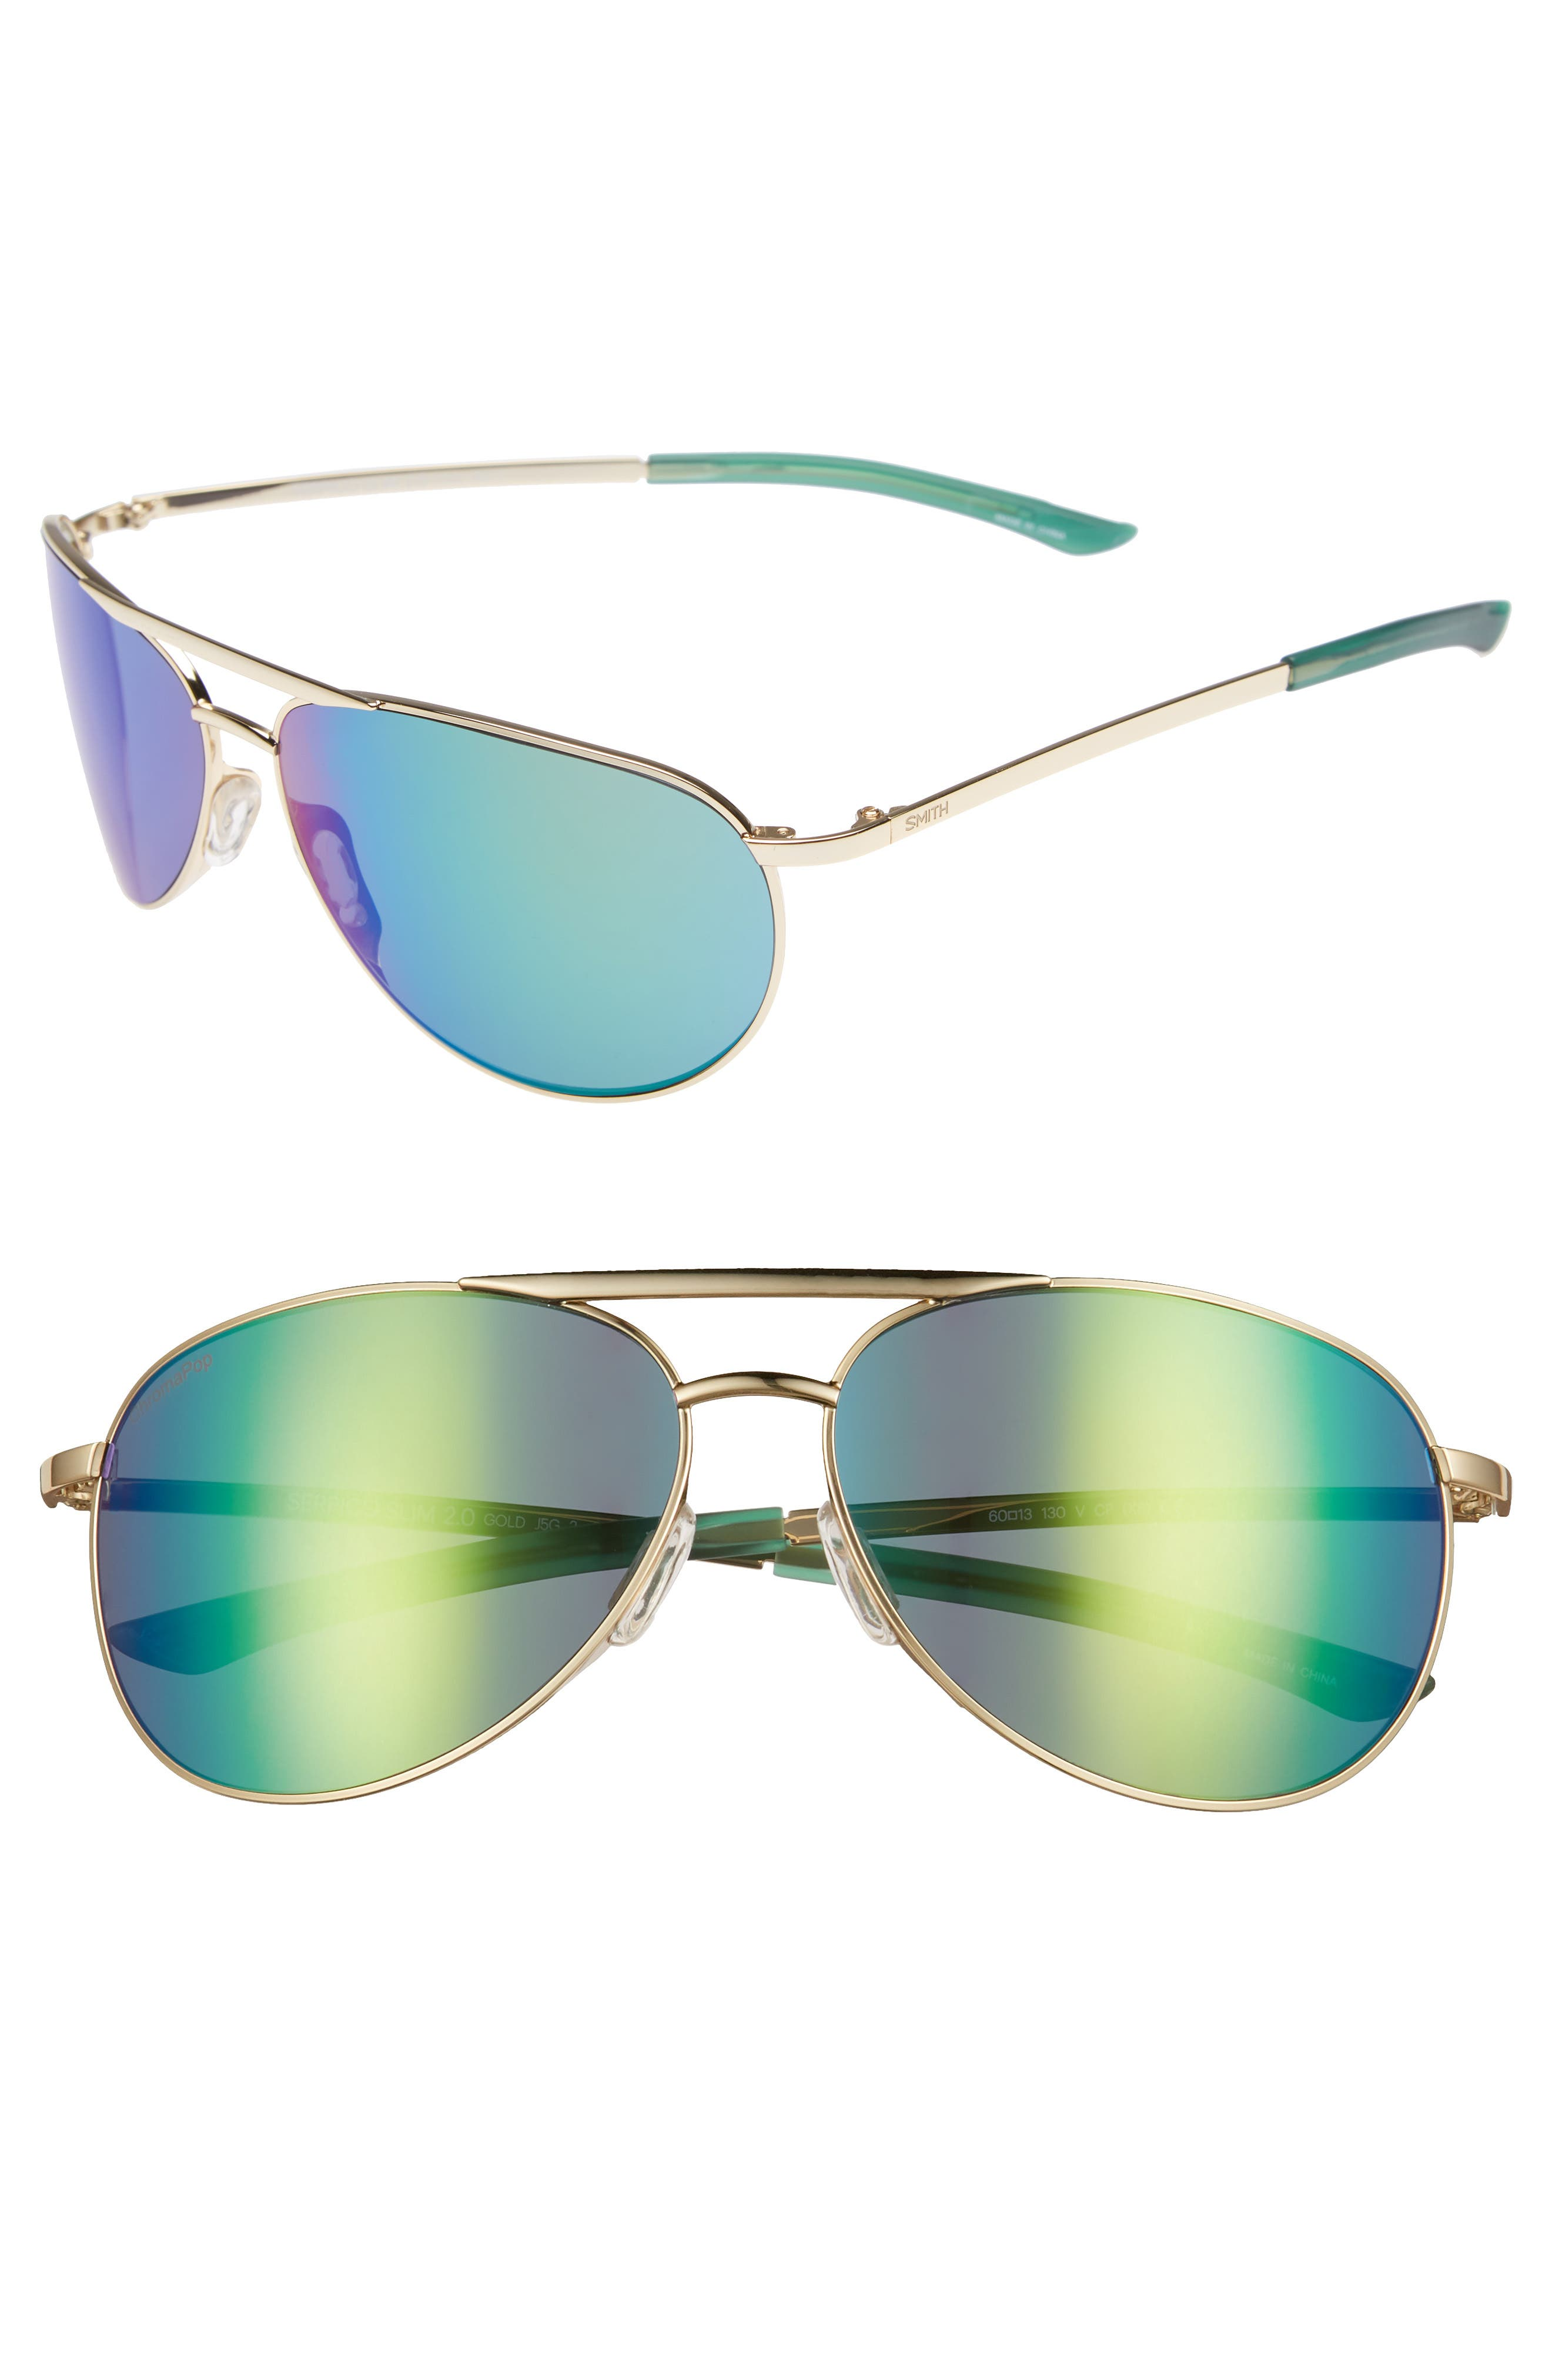 Serpico Slim 2.0 60mm ChromaPop Polarized Aviator Sunglasses,                             Main thumbnail 1, color,                             Gold/ Green Mirror